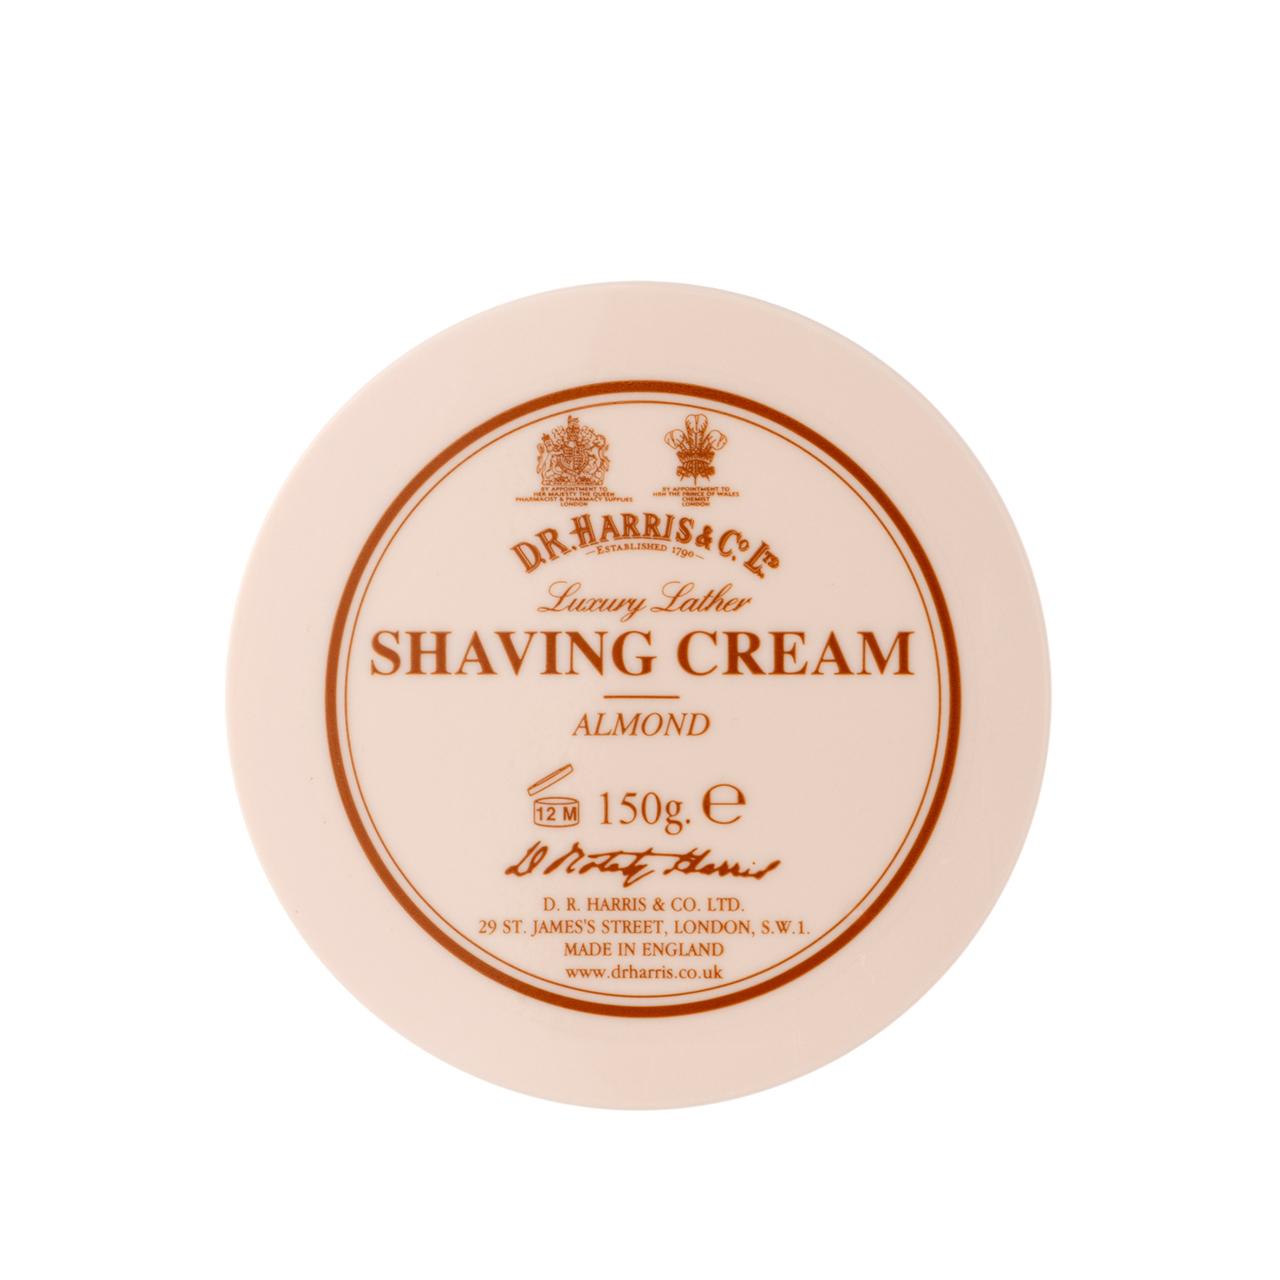 Almond - Shaving Cream Bowl